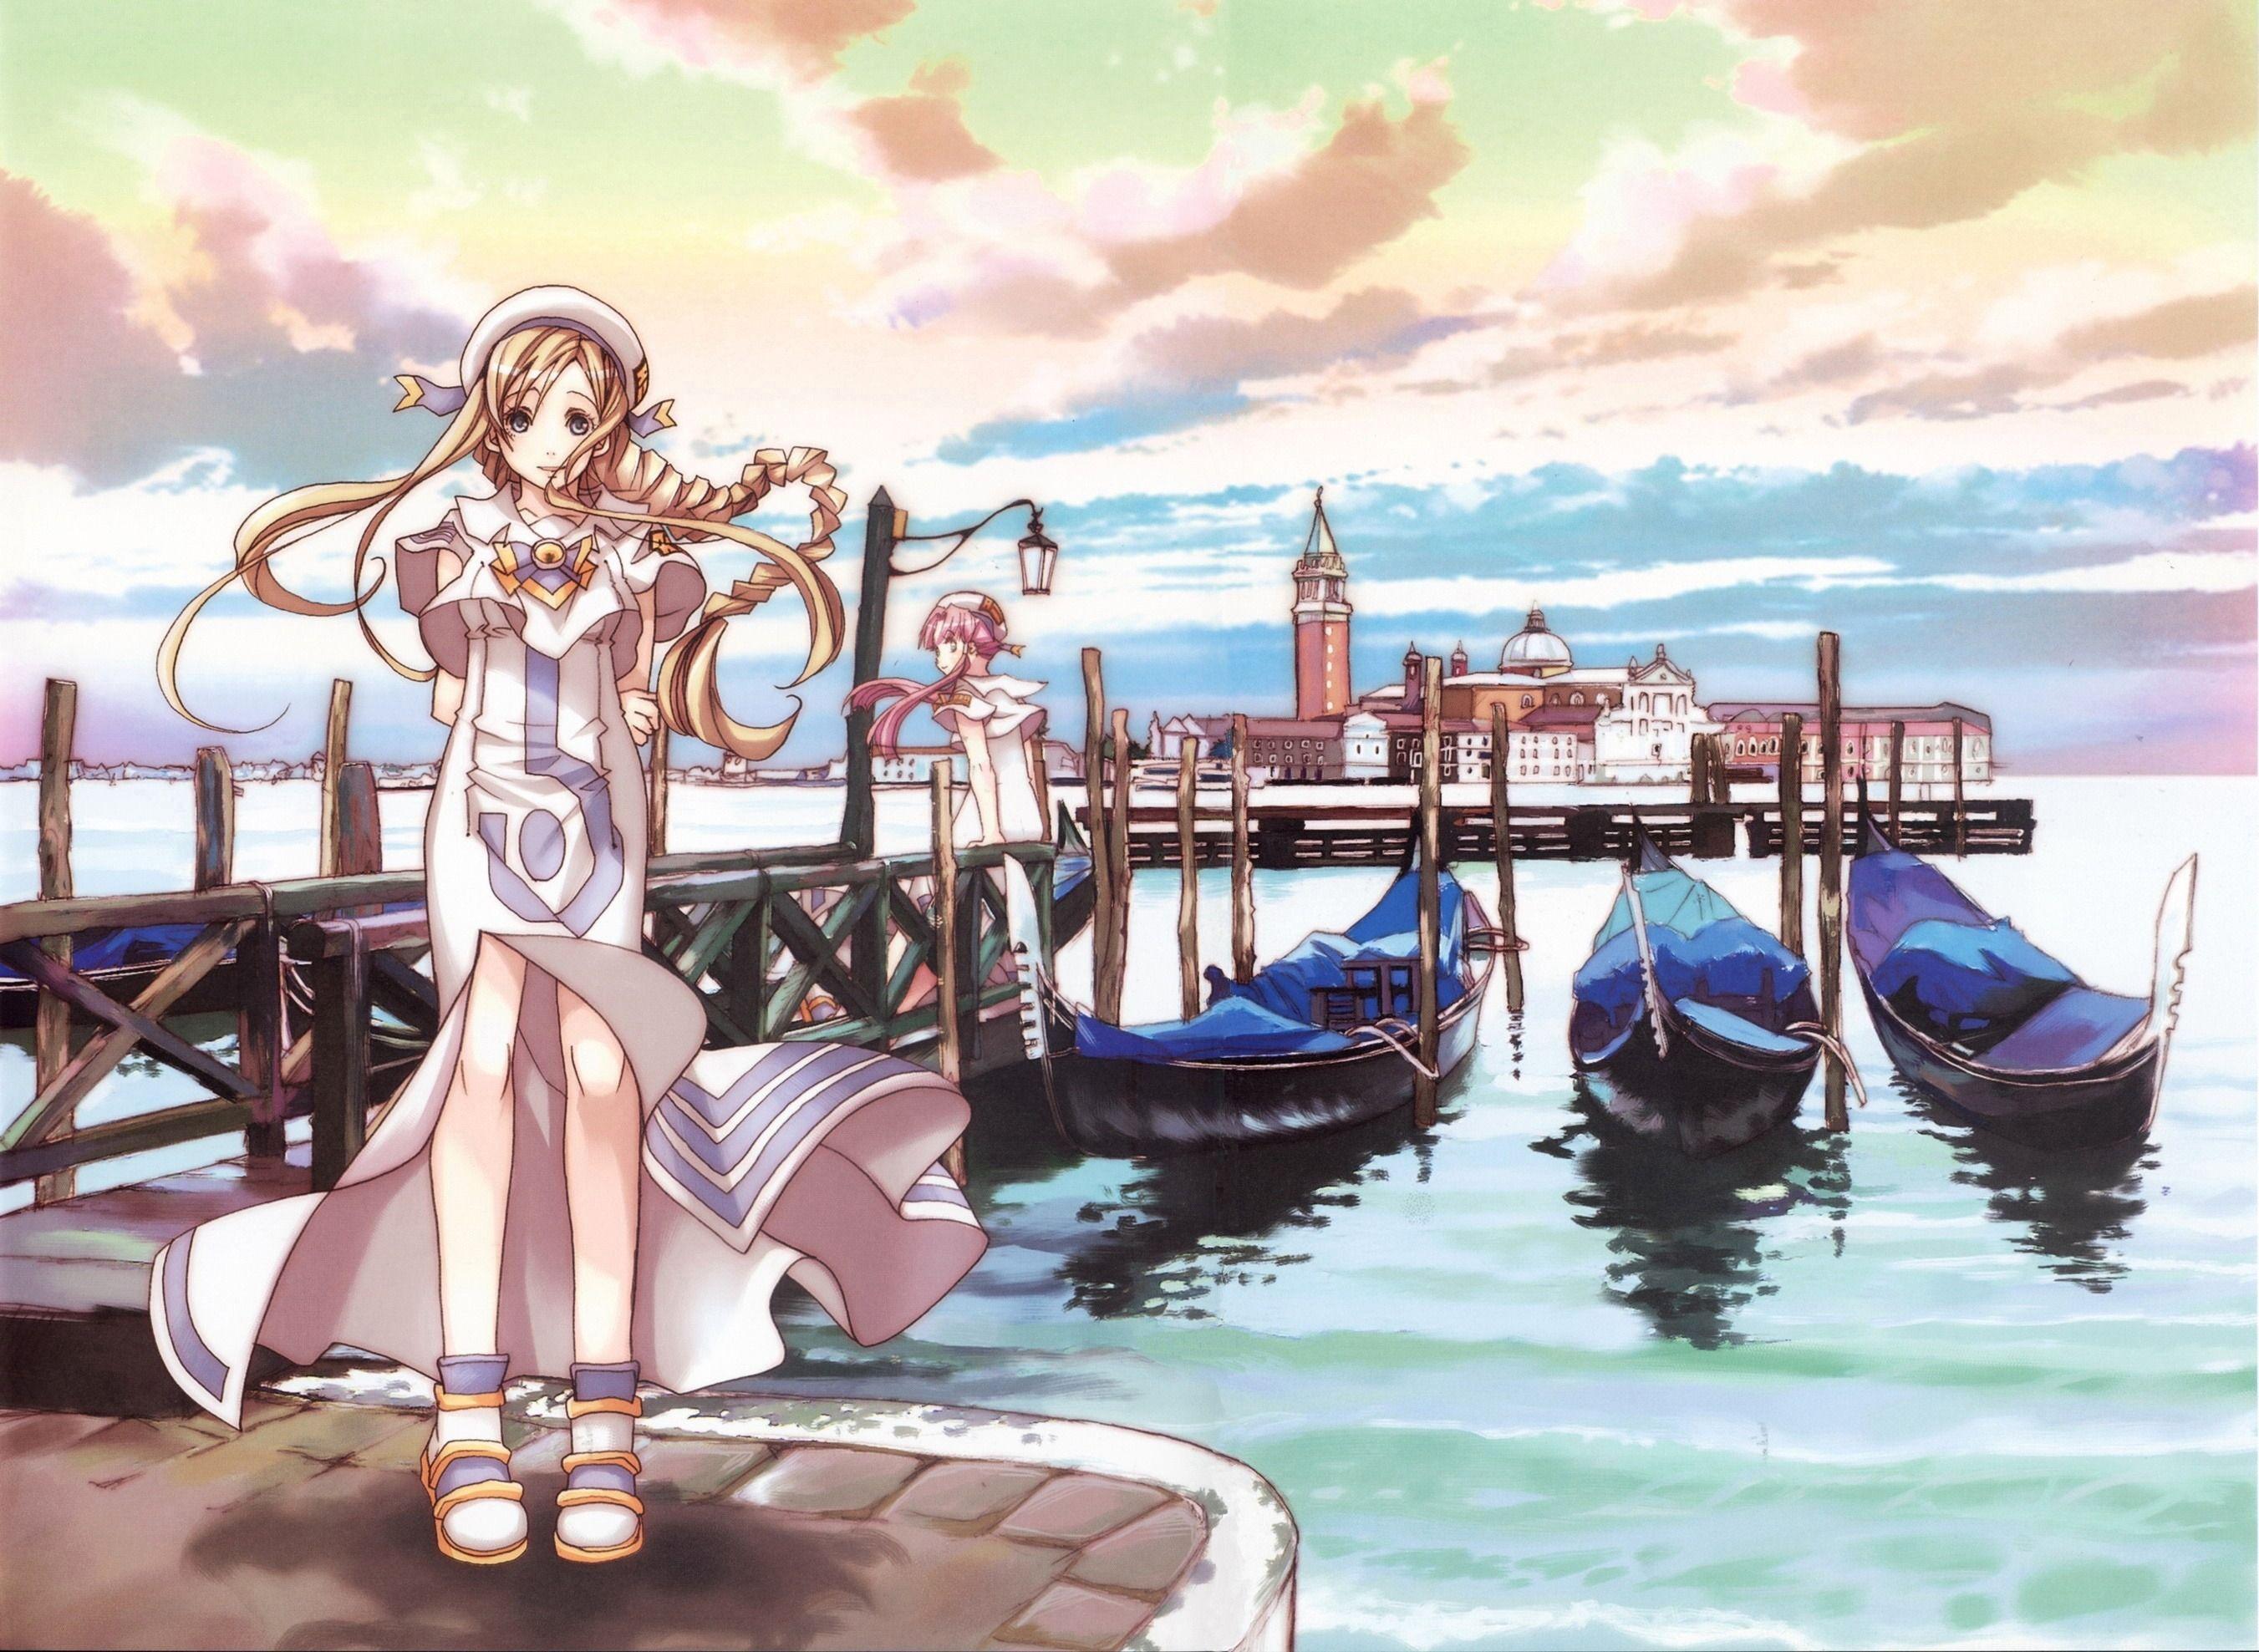 Alicia Amp Akari Aria アニメ イタリア ベネチア 可愛い女の子 イラスト